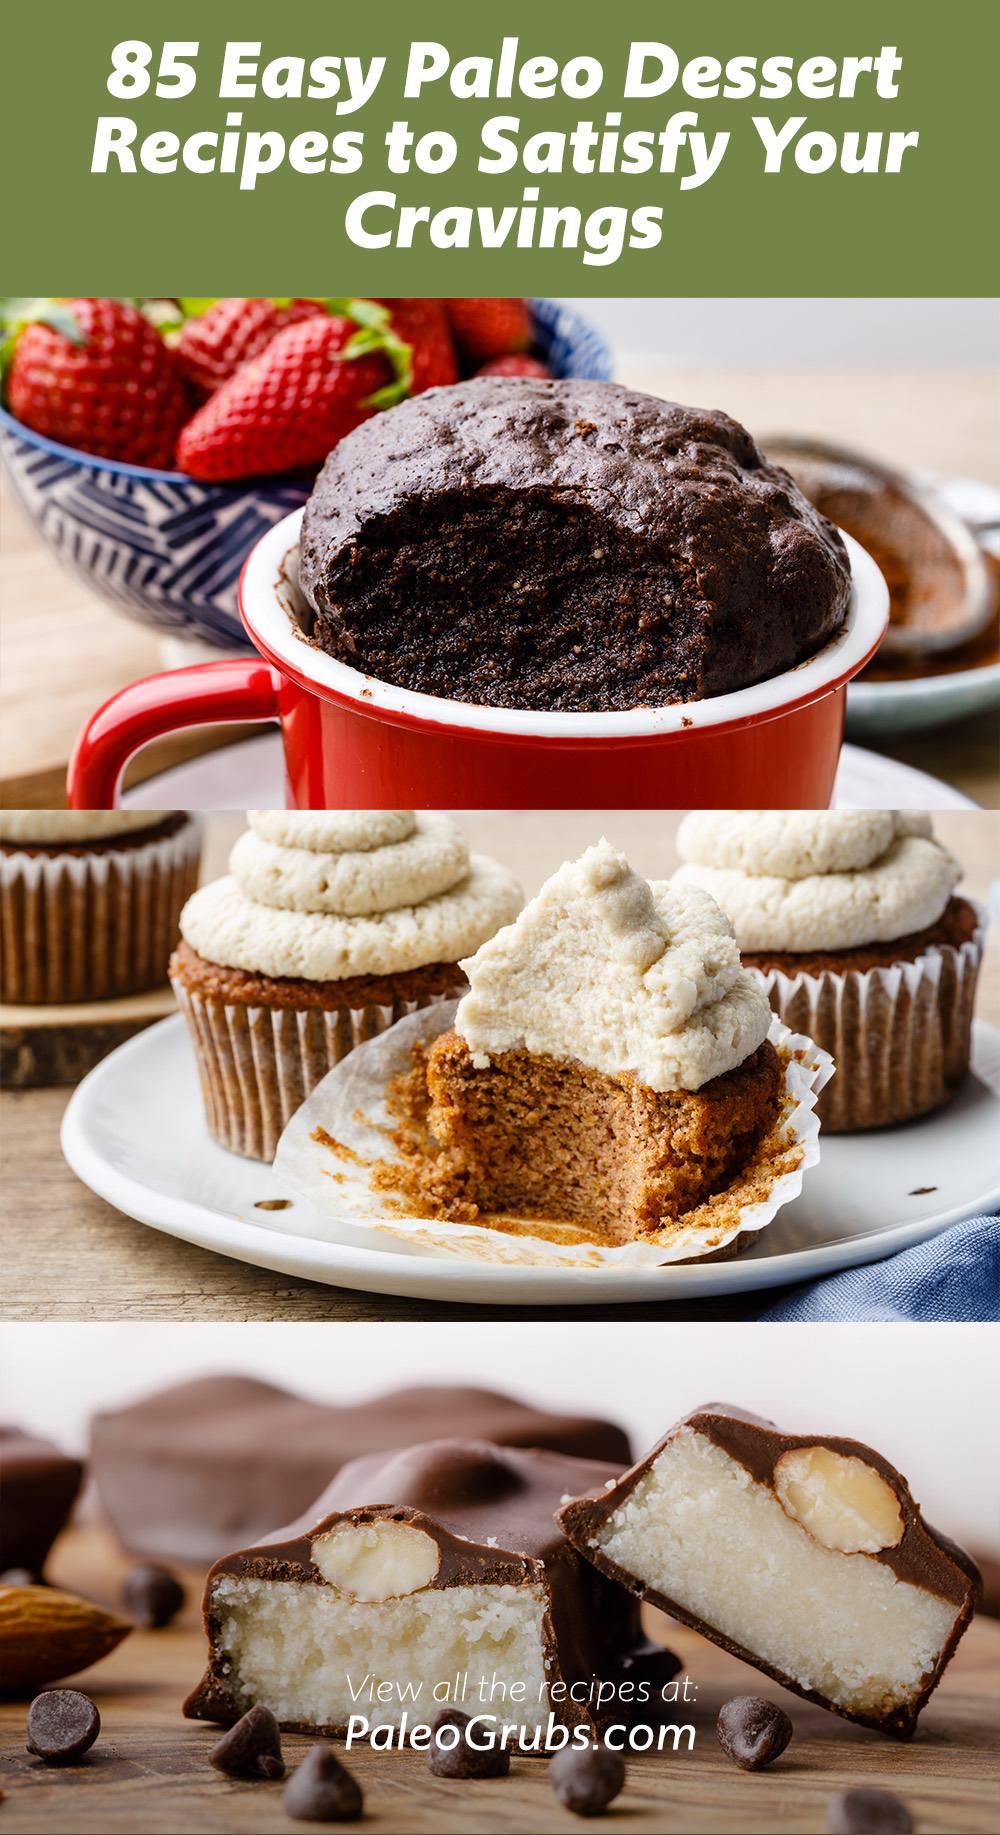 85 Easy Paleo Dessert Recipes to Satisfy Your Cravings